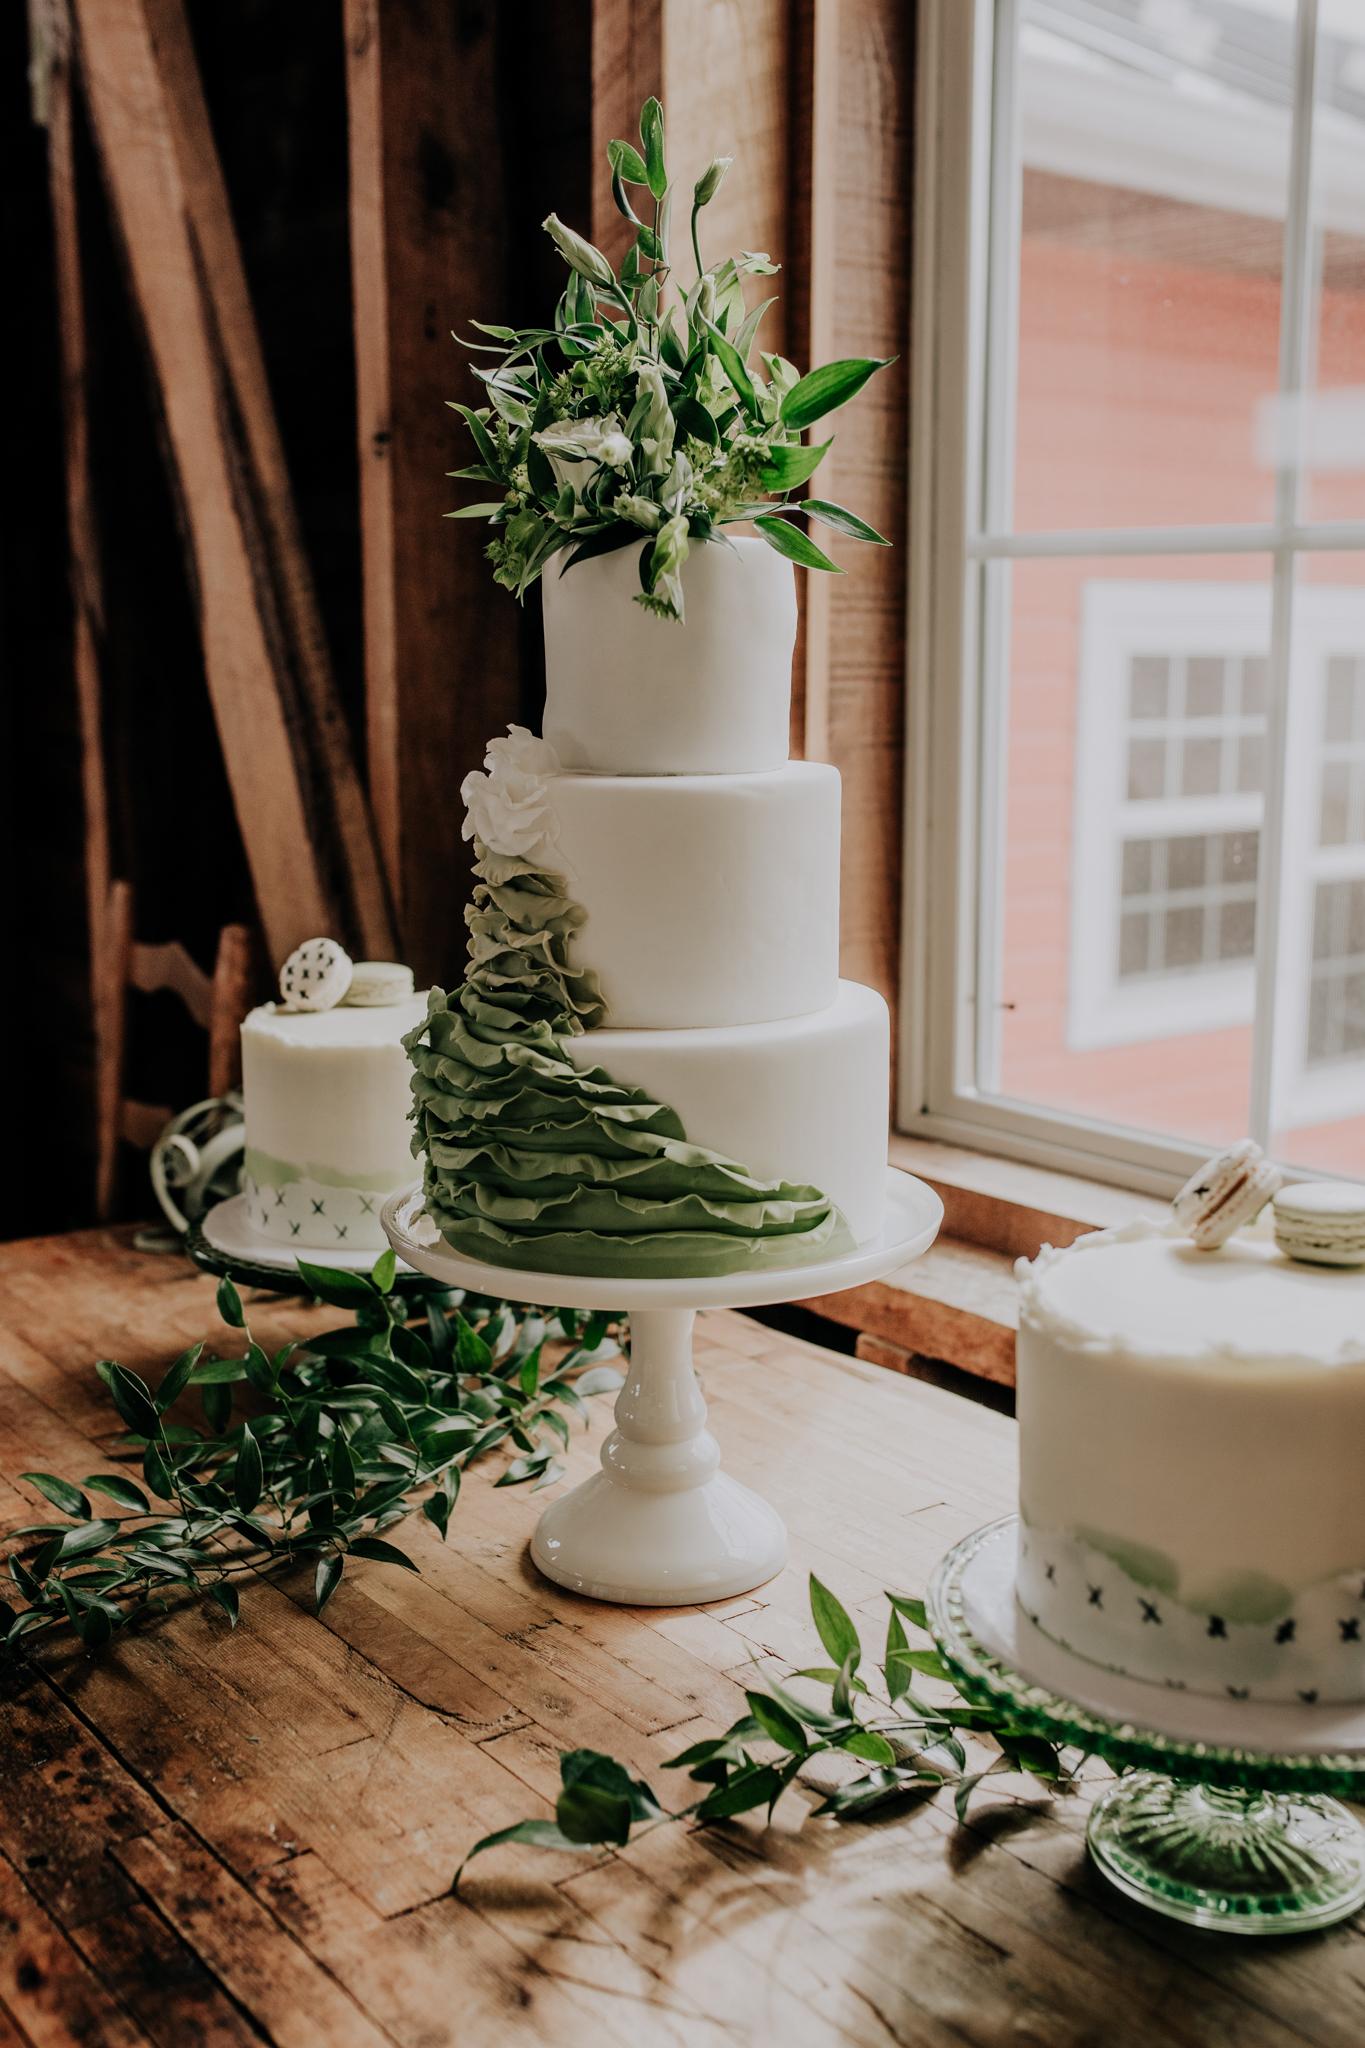 Yield Bakehouse - Wedding Cake - Green - Macaroon - Greenery - jewel Tone Wedding - Ambre Cake - Hove Photography